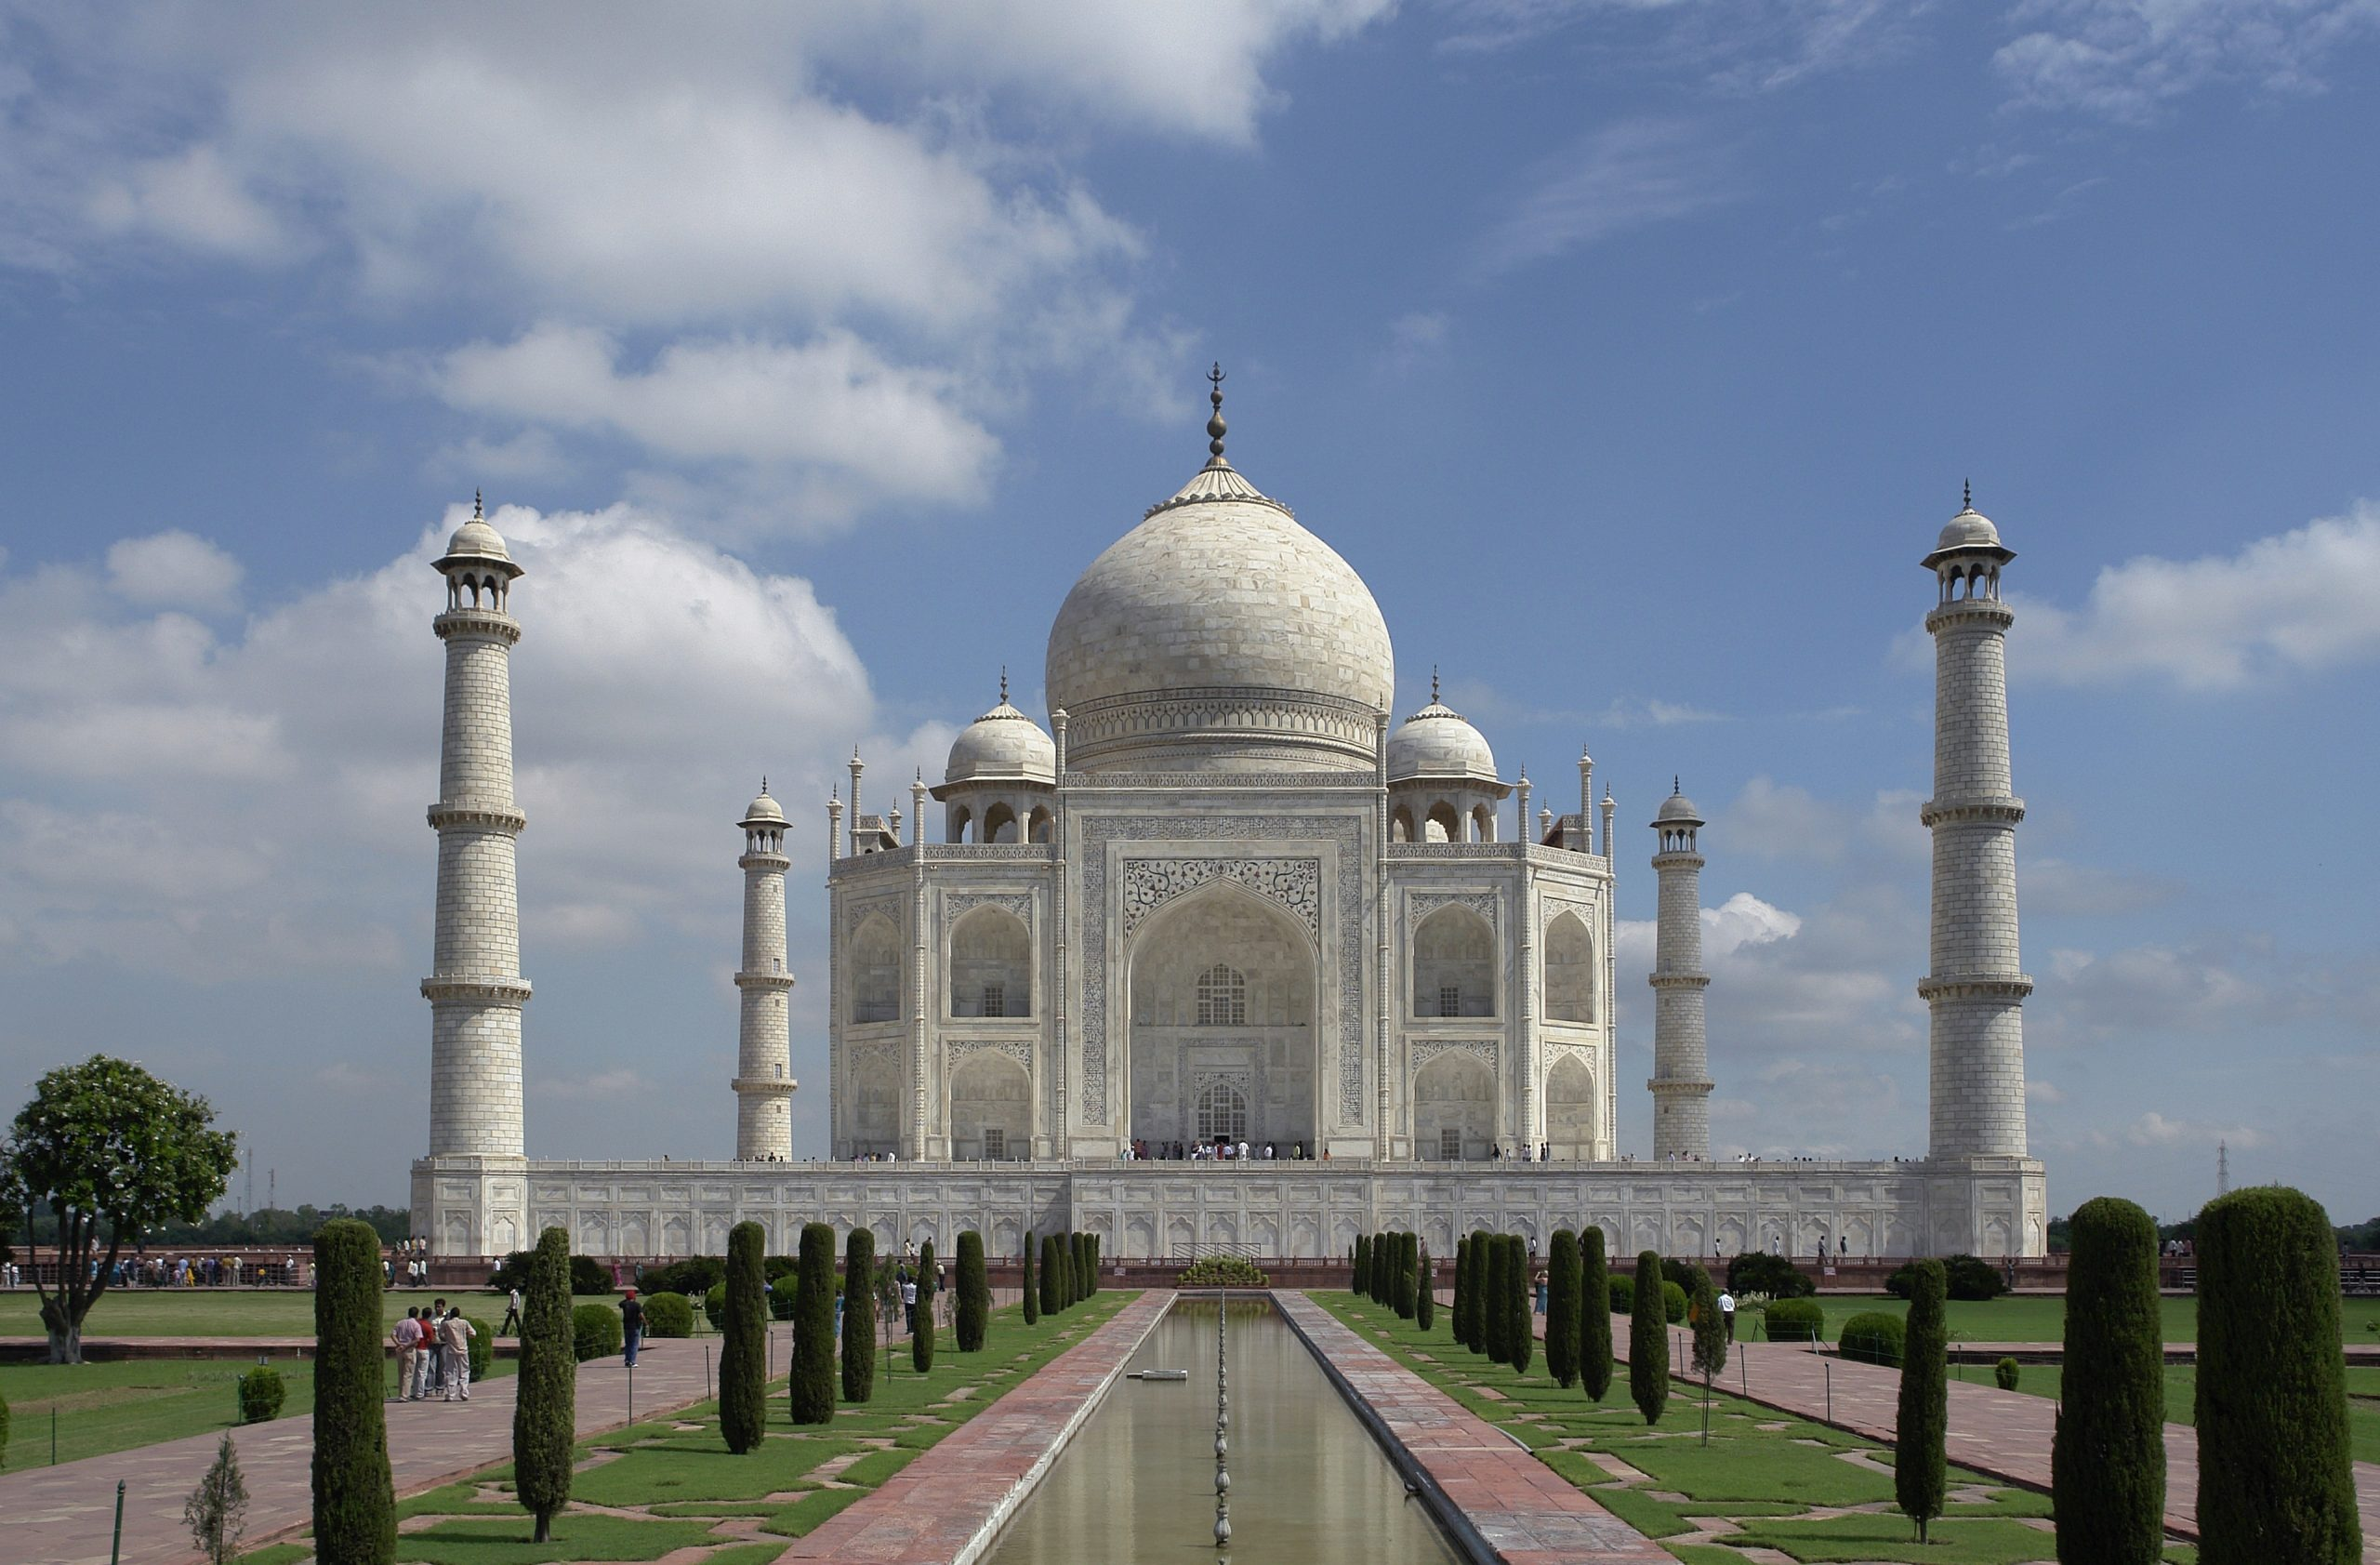 Top Place in Agra-Sikandra Fort-The Taj Mahal